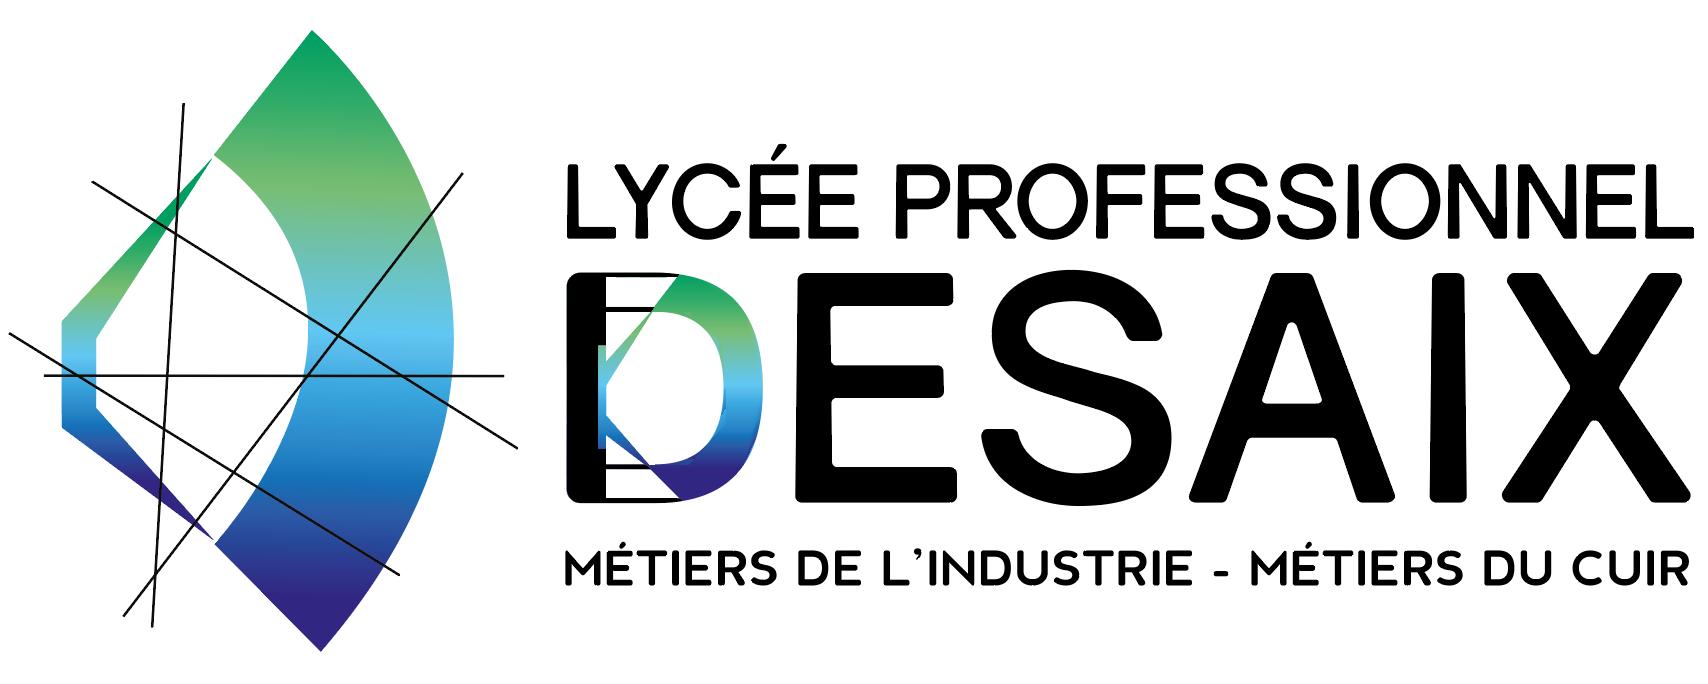 LOGO LYCEE DESAIX.png